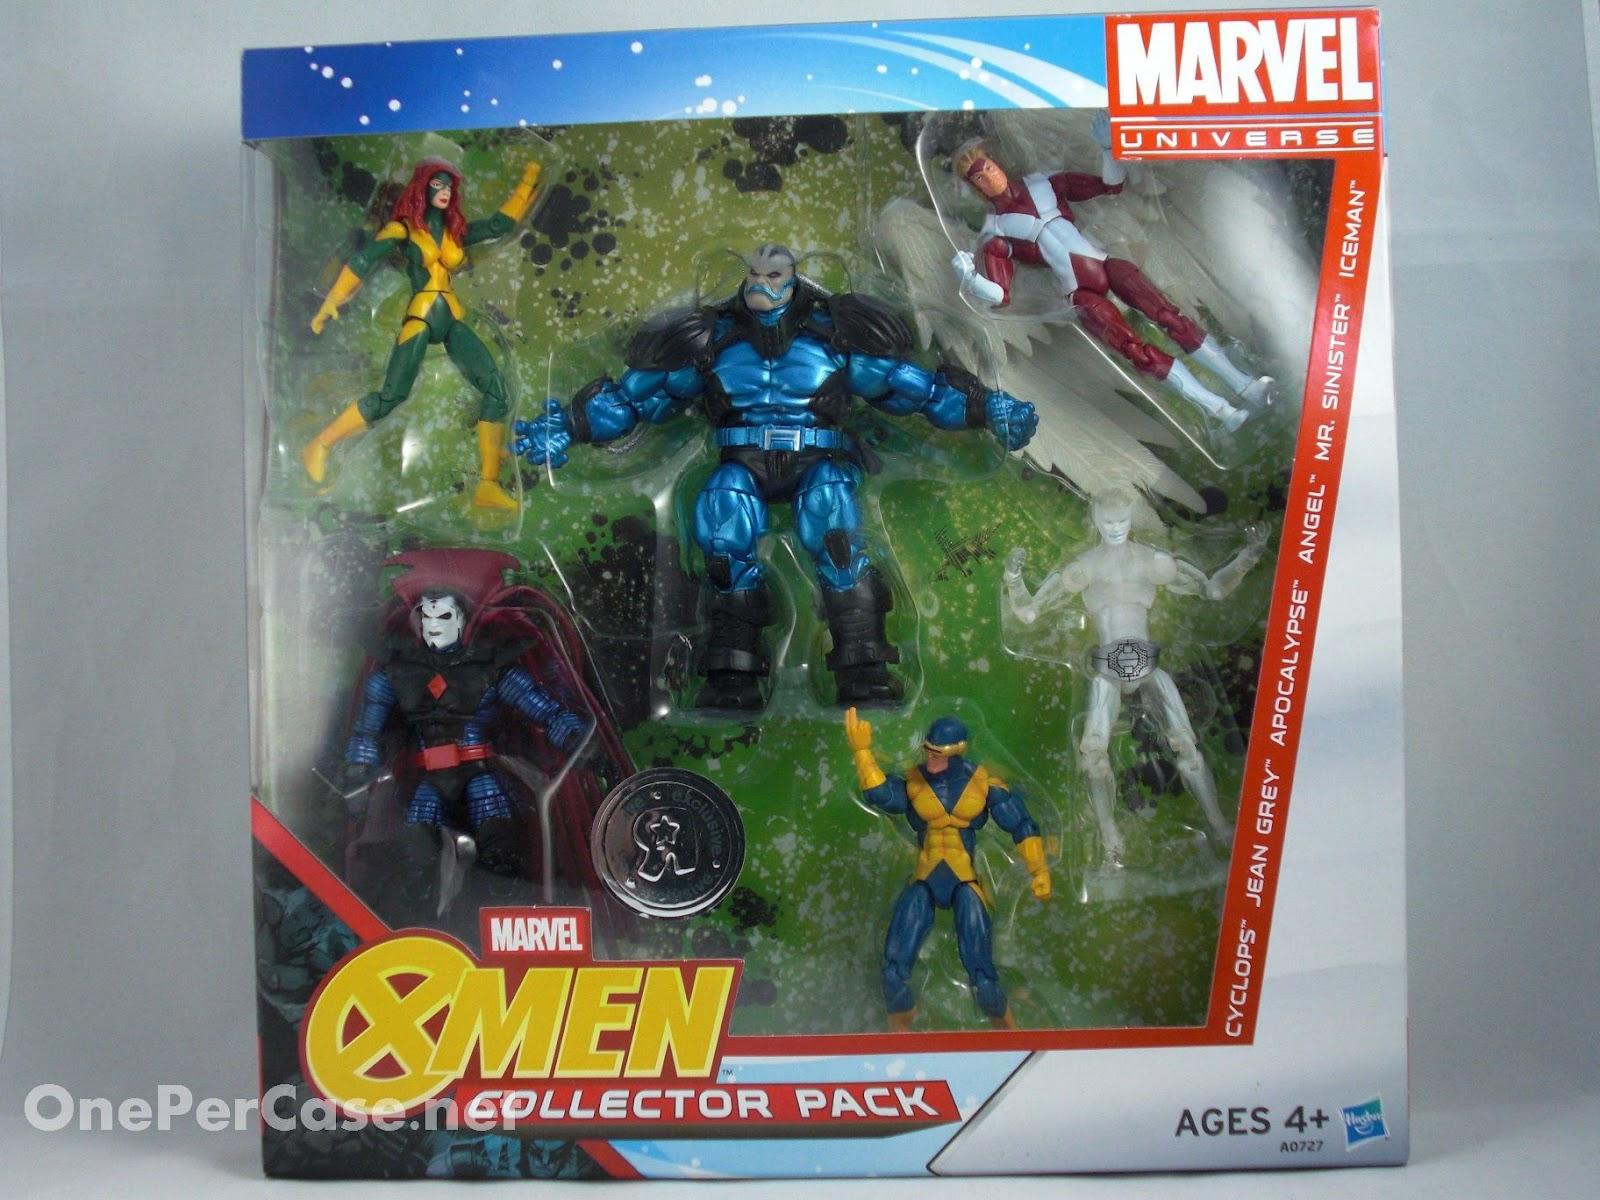 Marvel Toys R Us : One per case marvel universe factor men collector